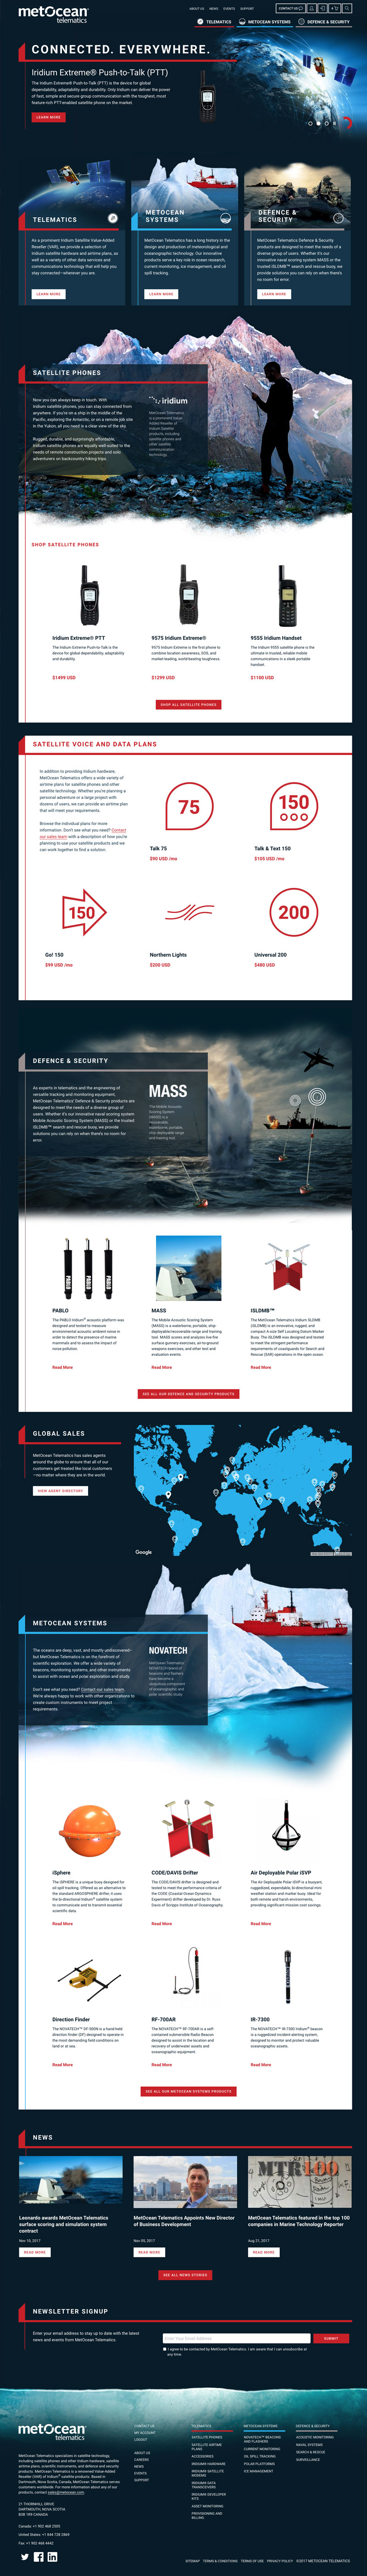 A screenshot of the full MetOcean homepage